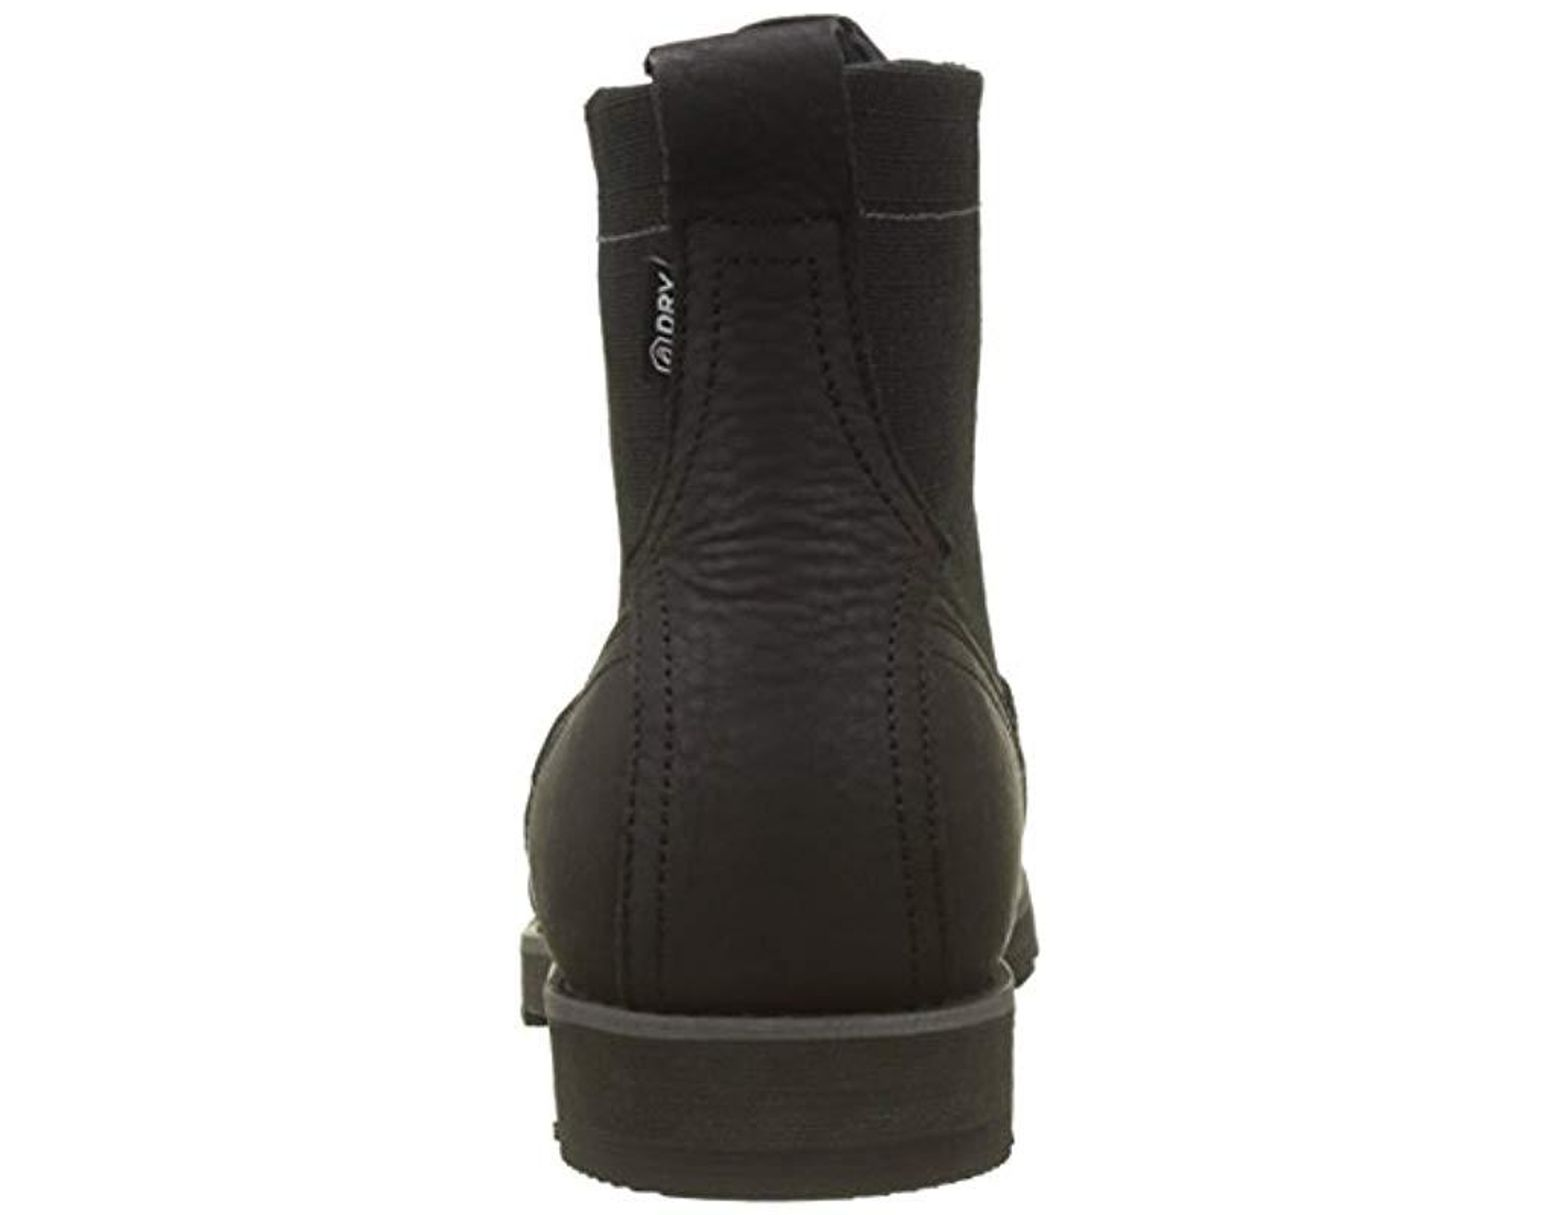 5e0a6de4 Levi's Logan Ca Desert Boots in Black for Men - Lyst